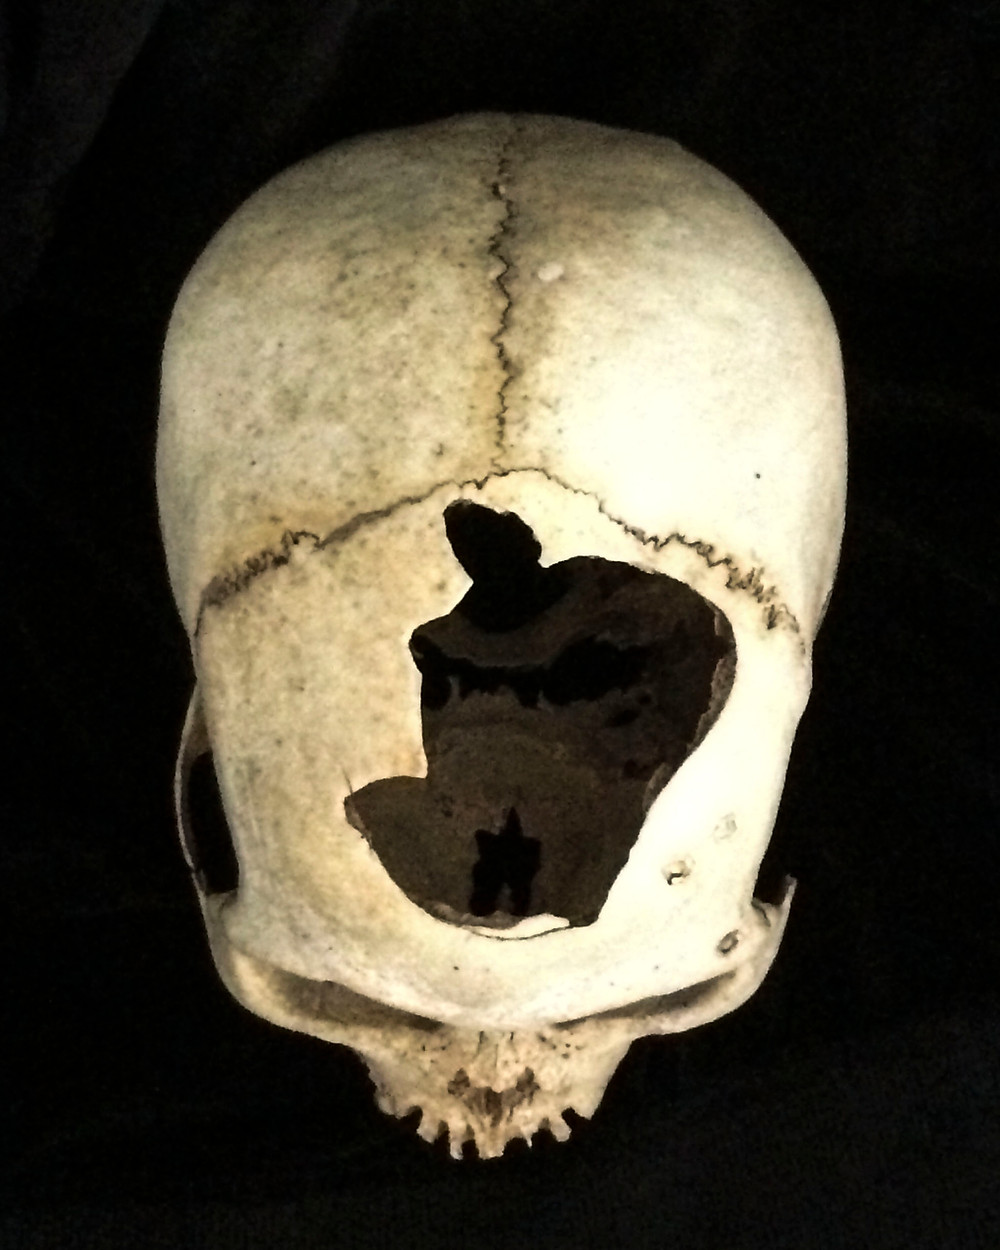 Skull from above